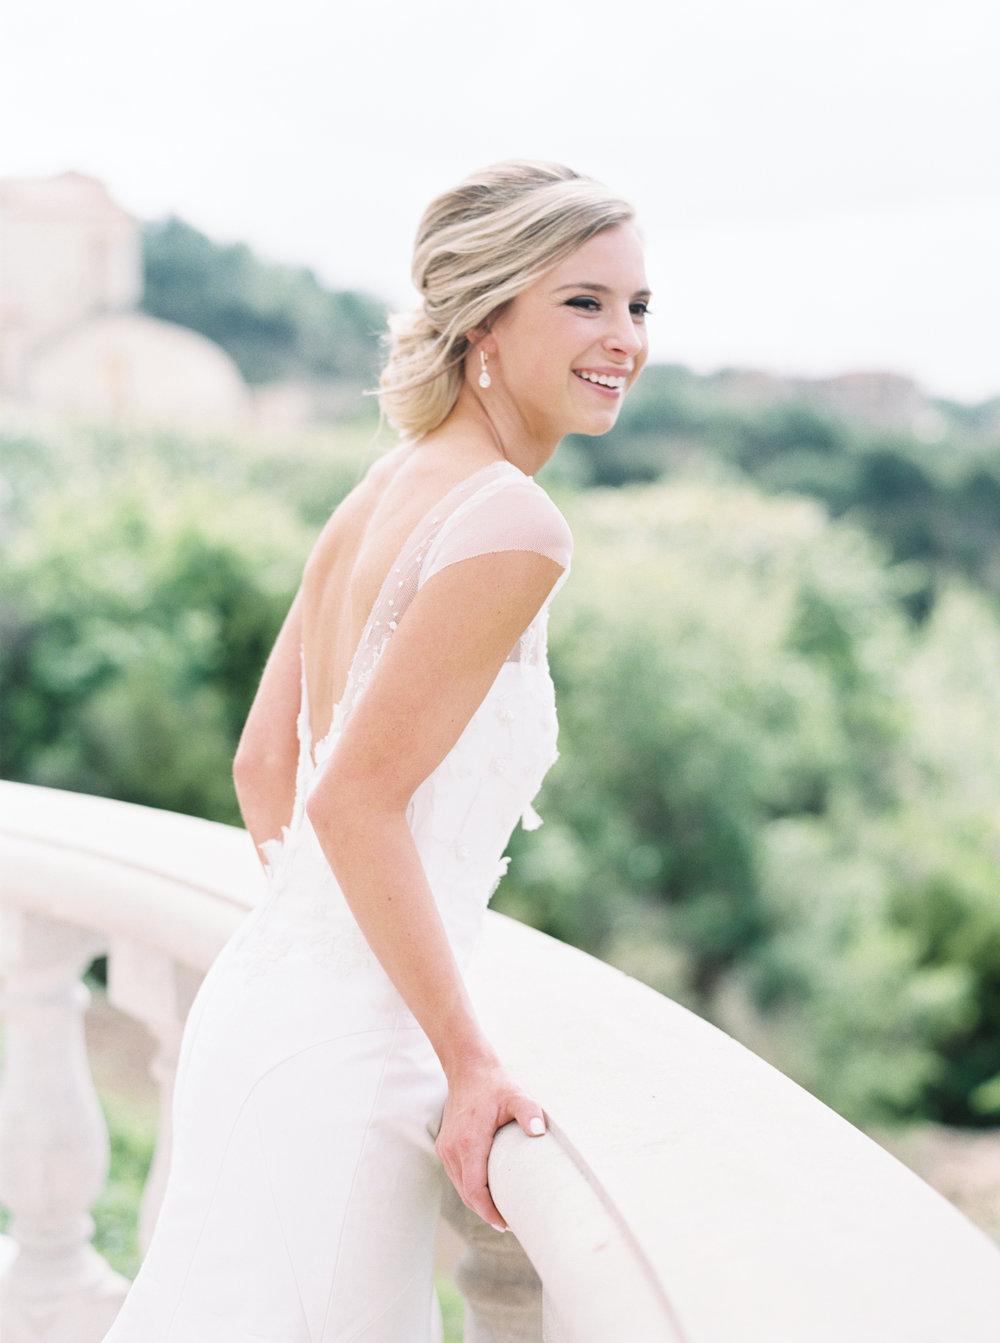 jenna-mcelroy-bridal-portraits-a-southern-tradition-10